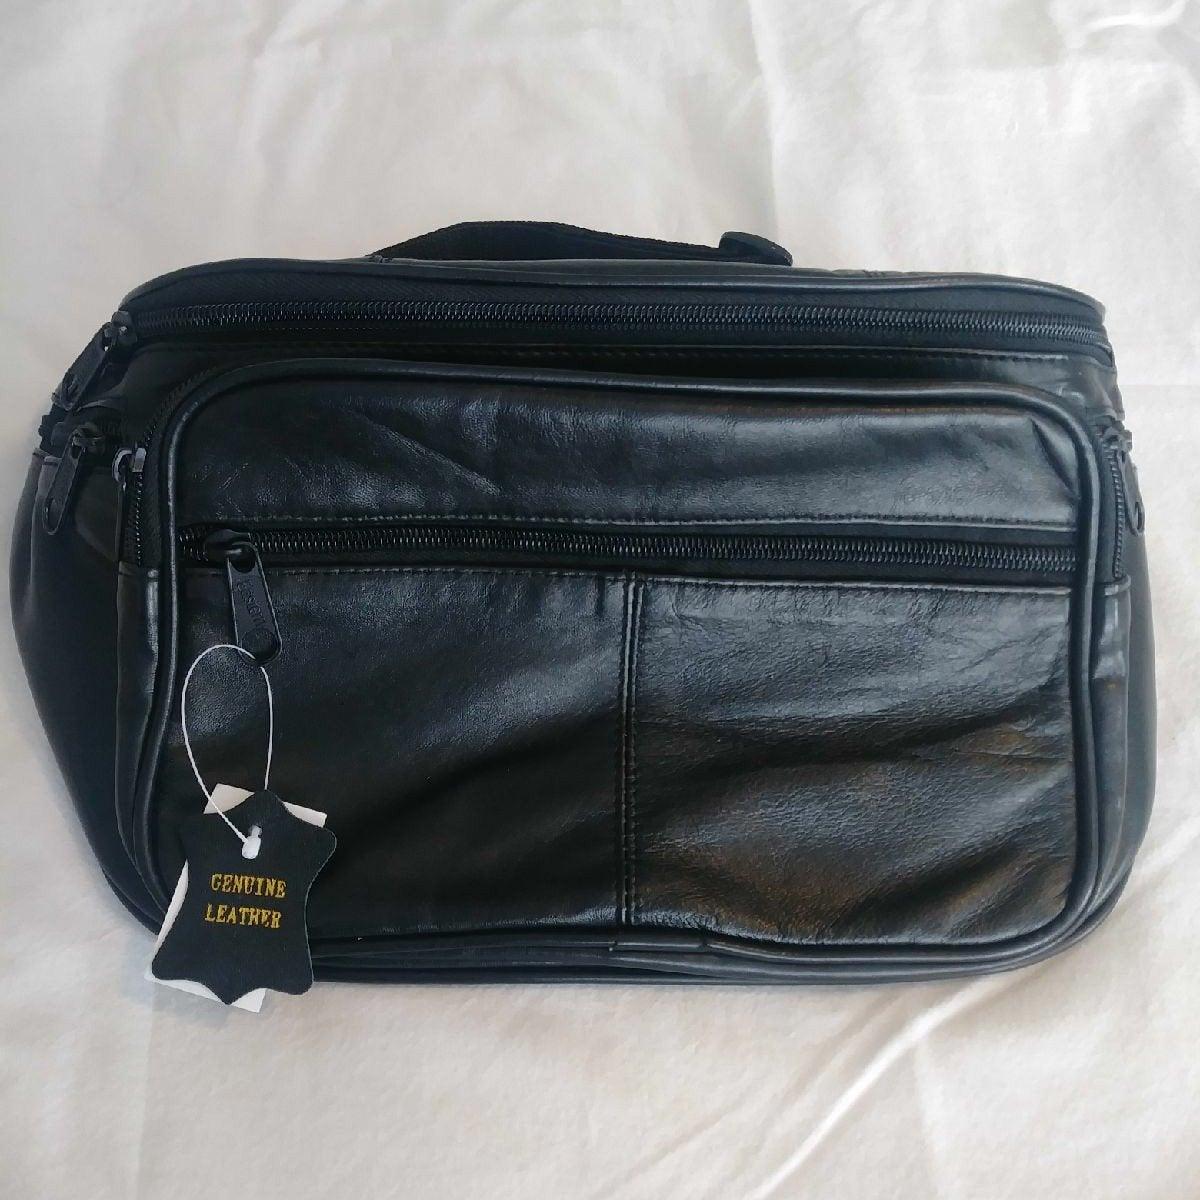 Mens, large, hip/travel bag